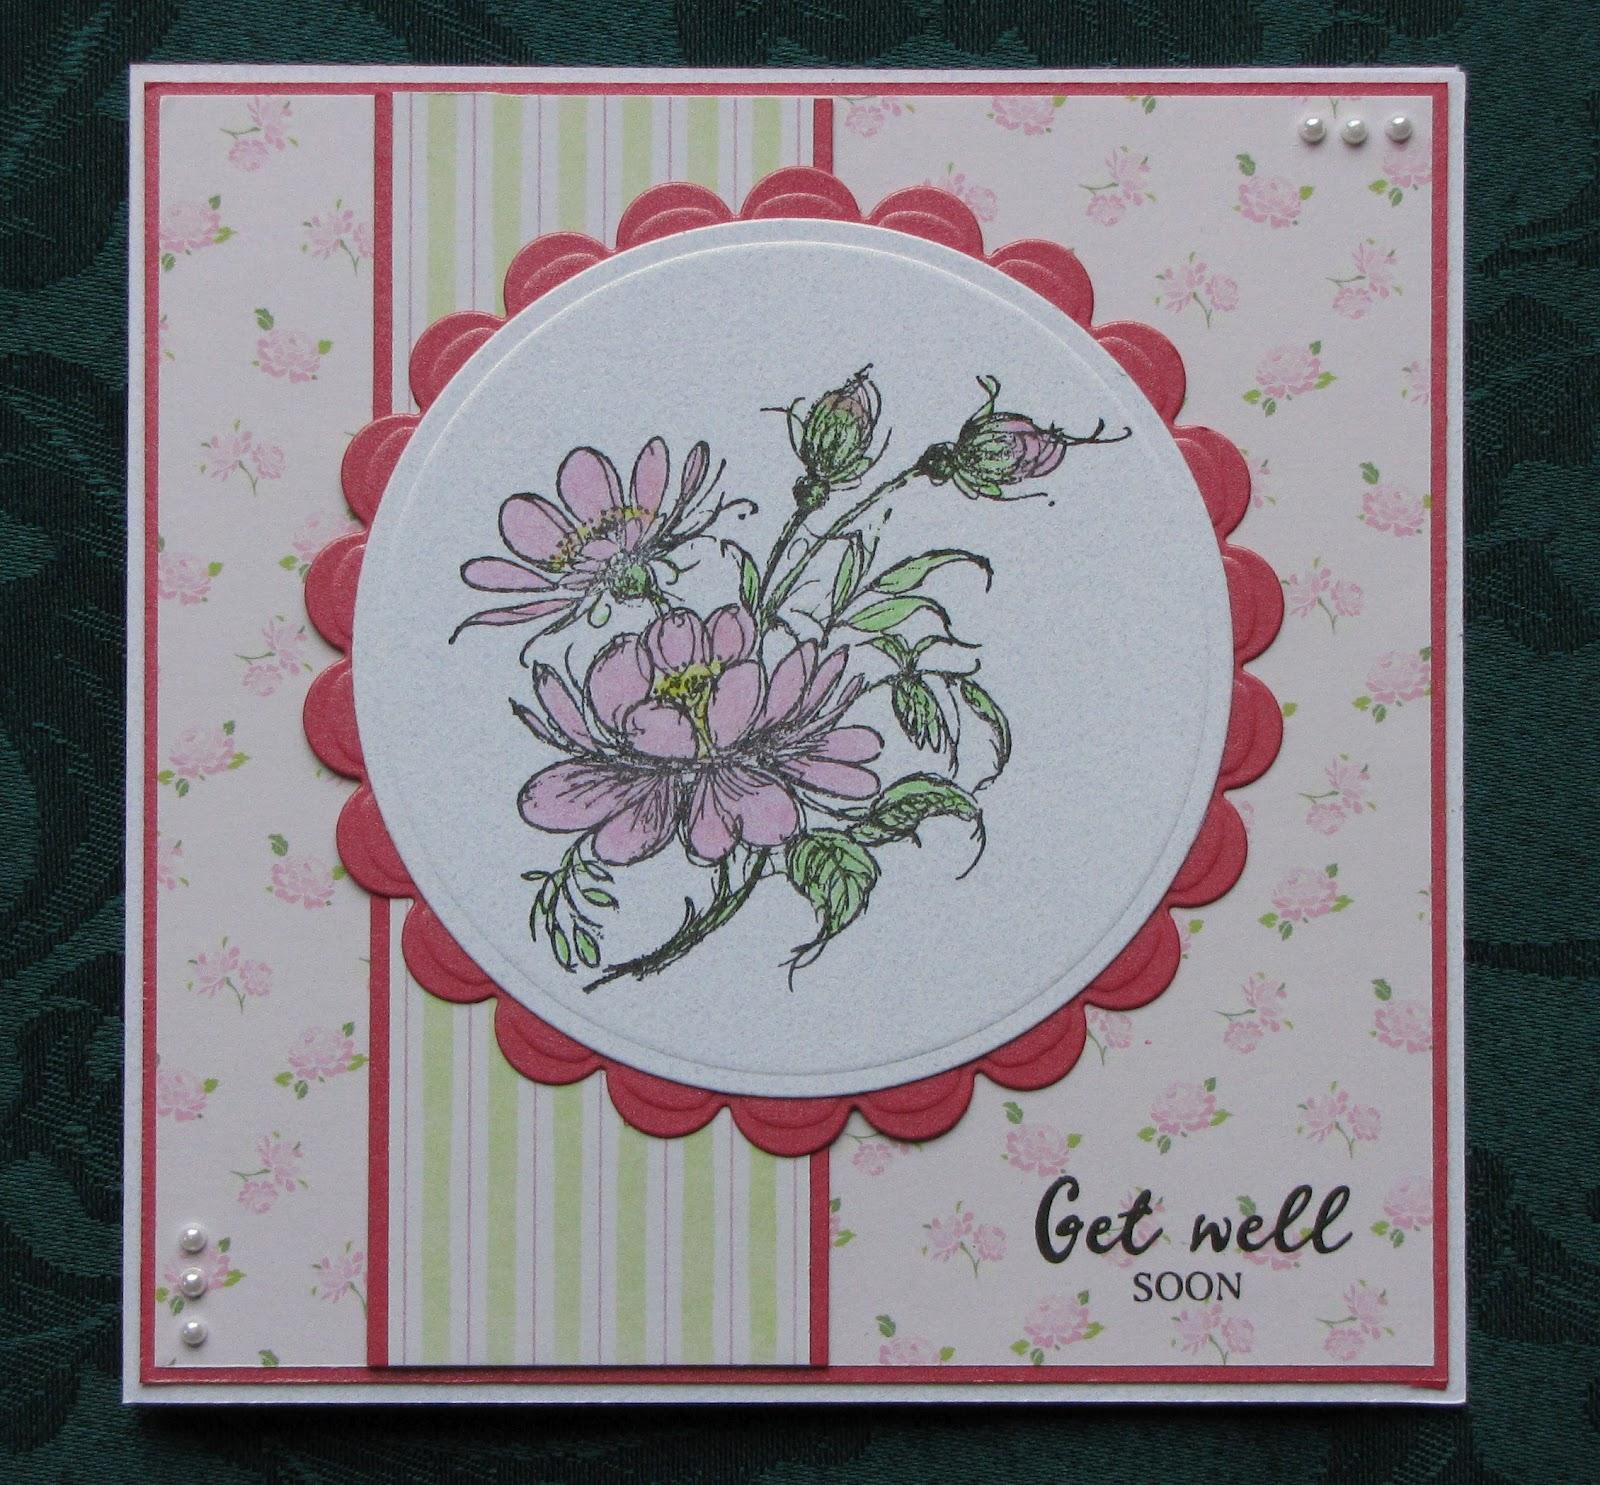 Handmade By Kath: Get Well Soon